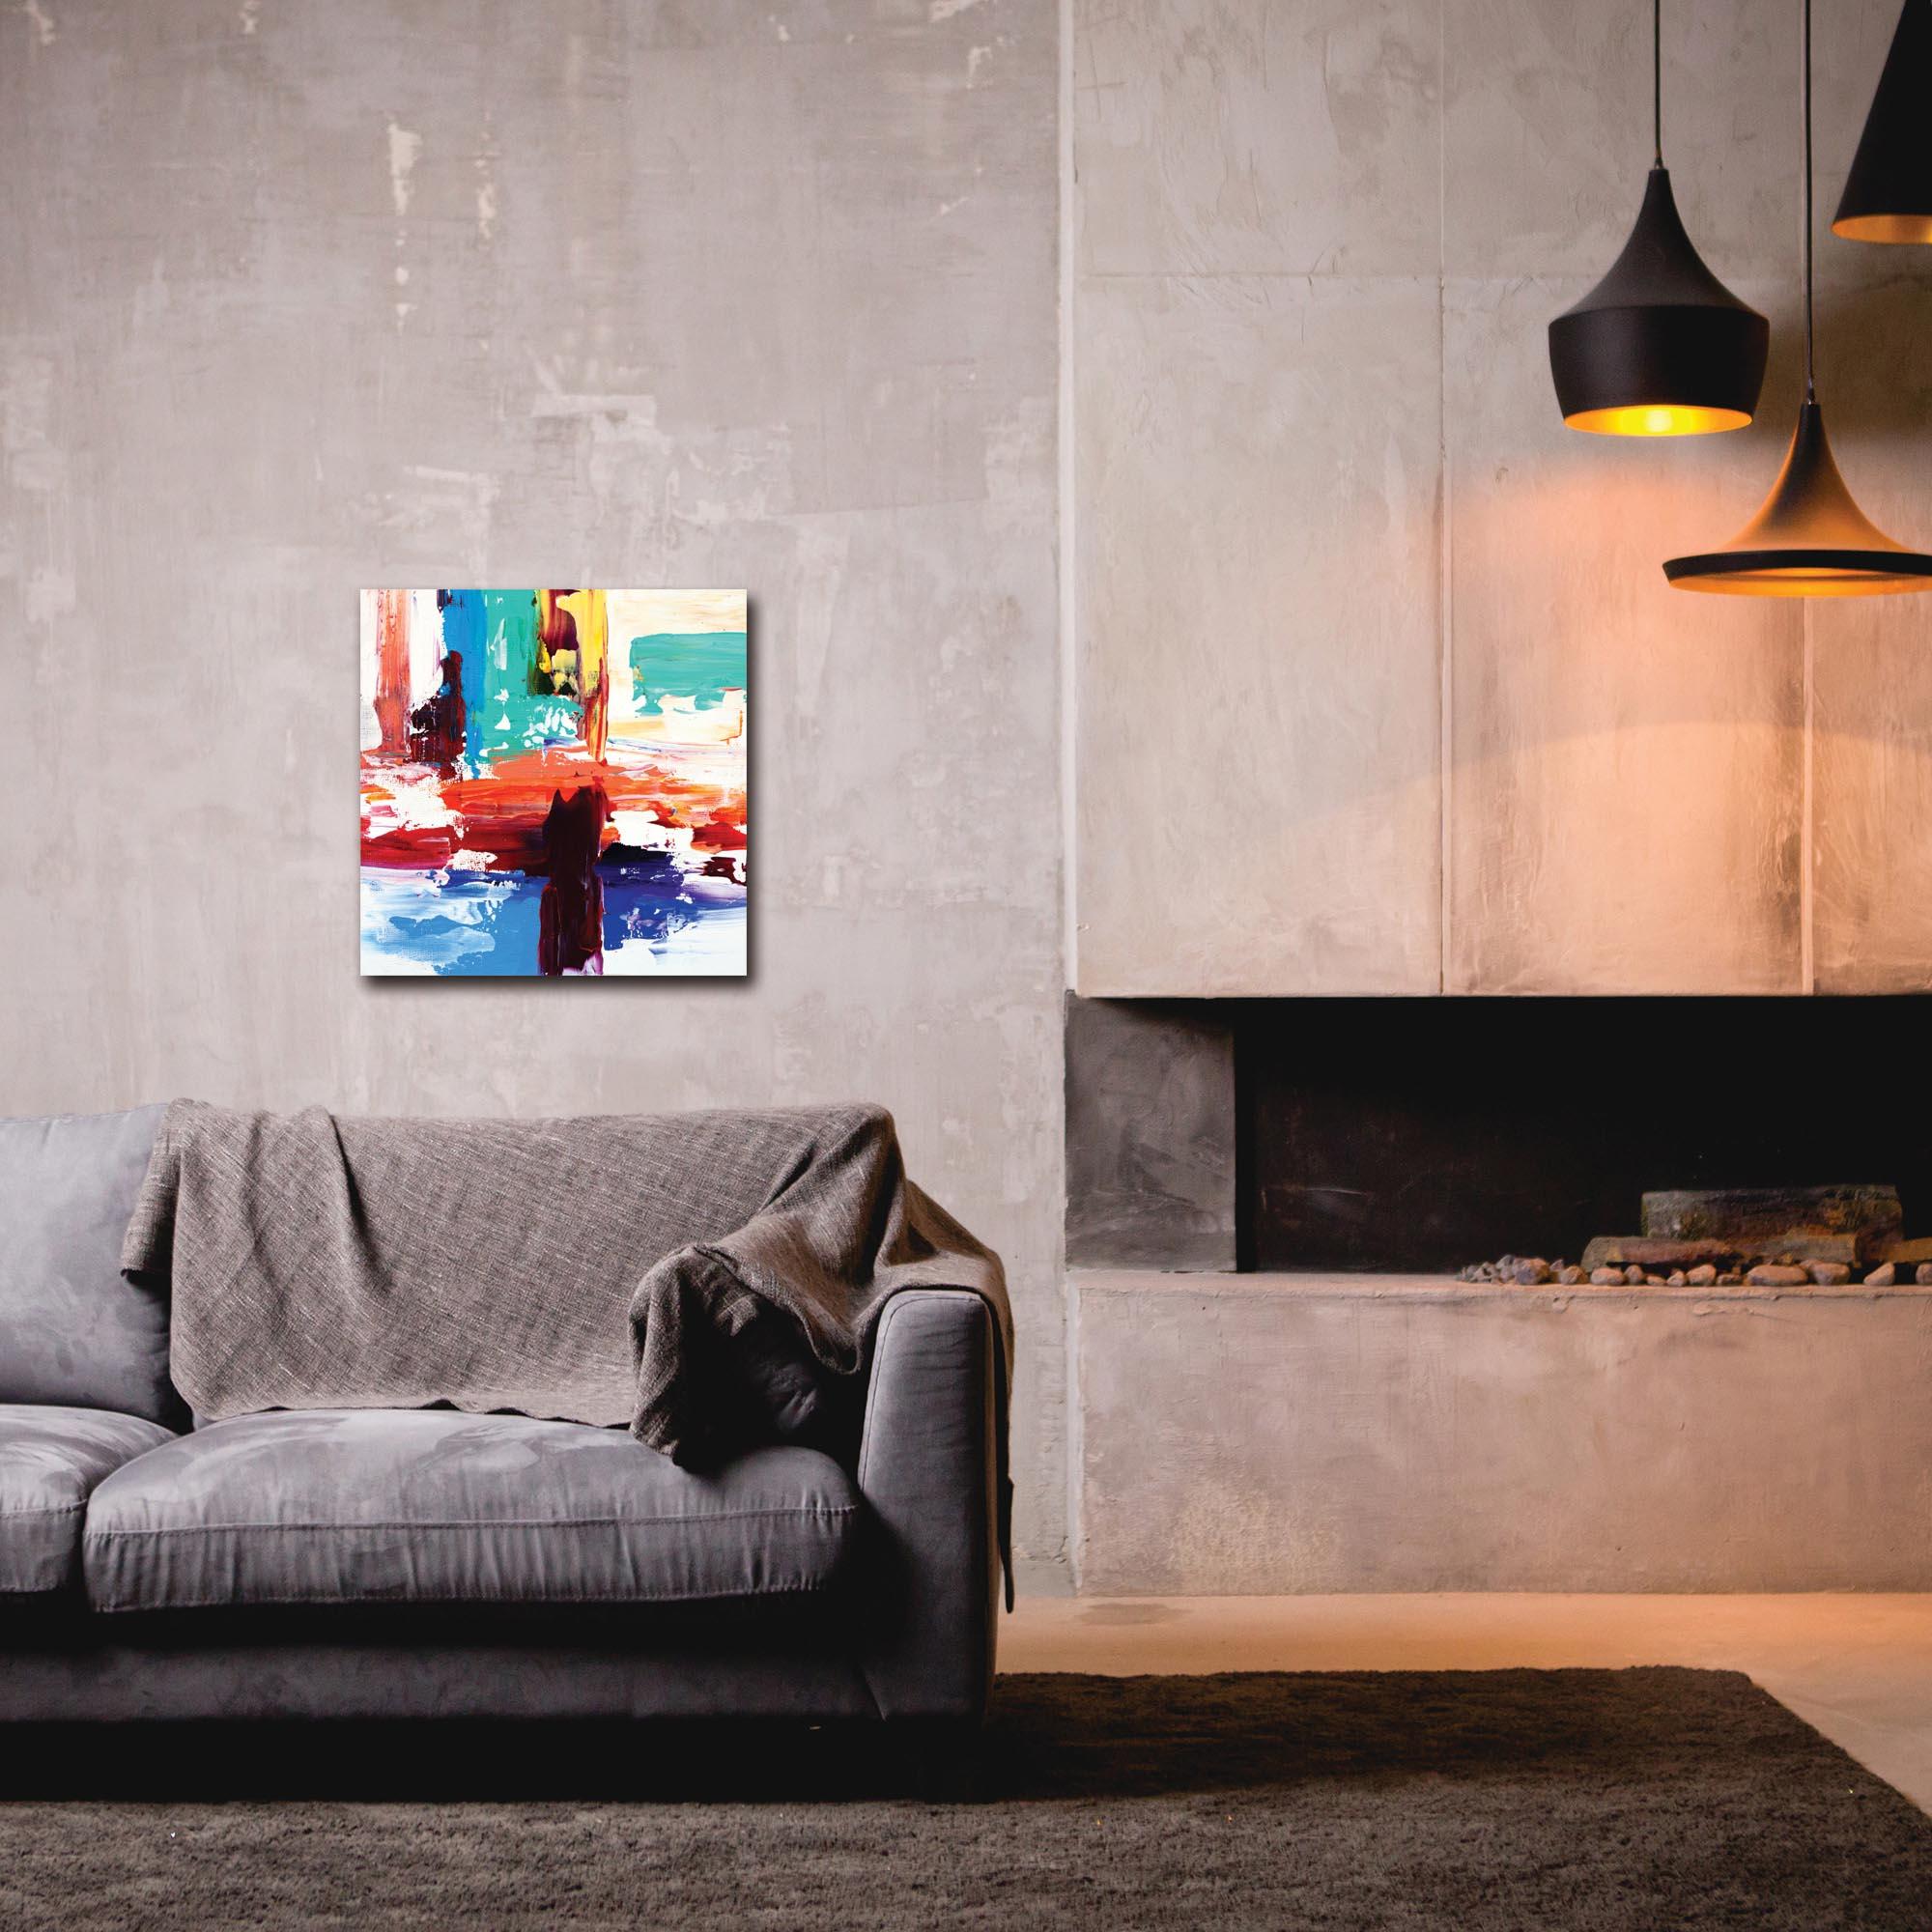 Abstract Wall Art 'Urban Life 3' - Urban Decor on Metal or Plexiglass - Lifestyle View